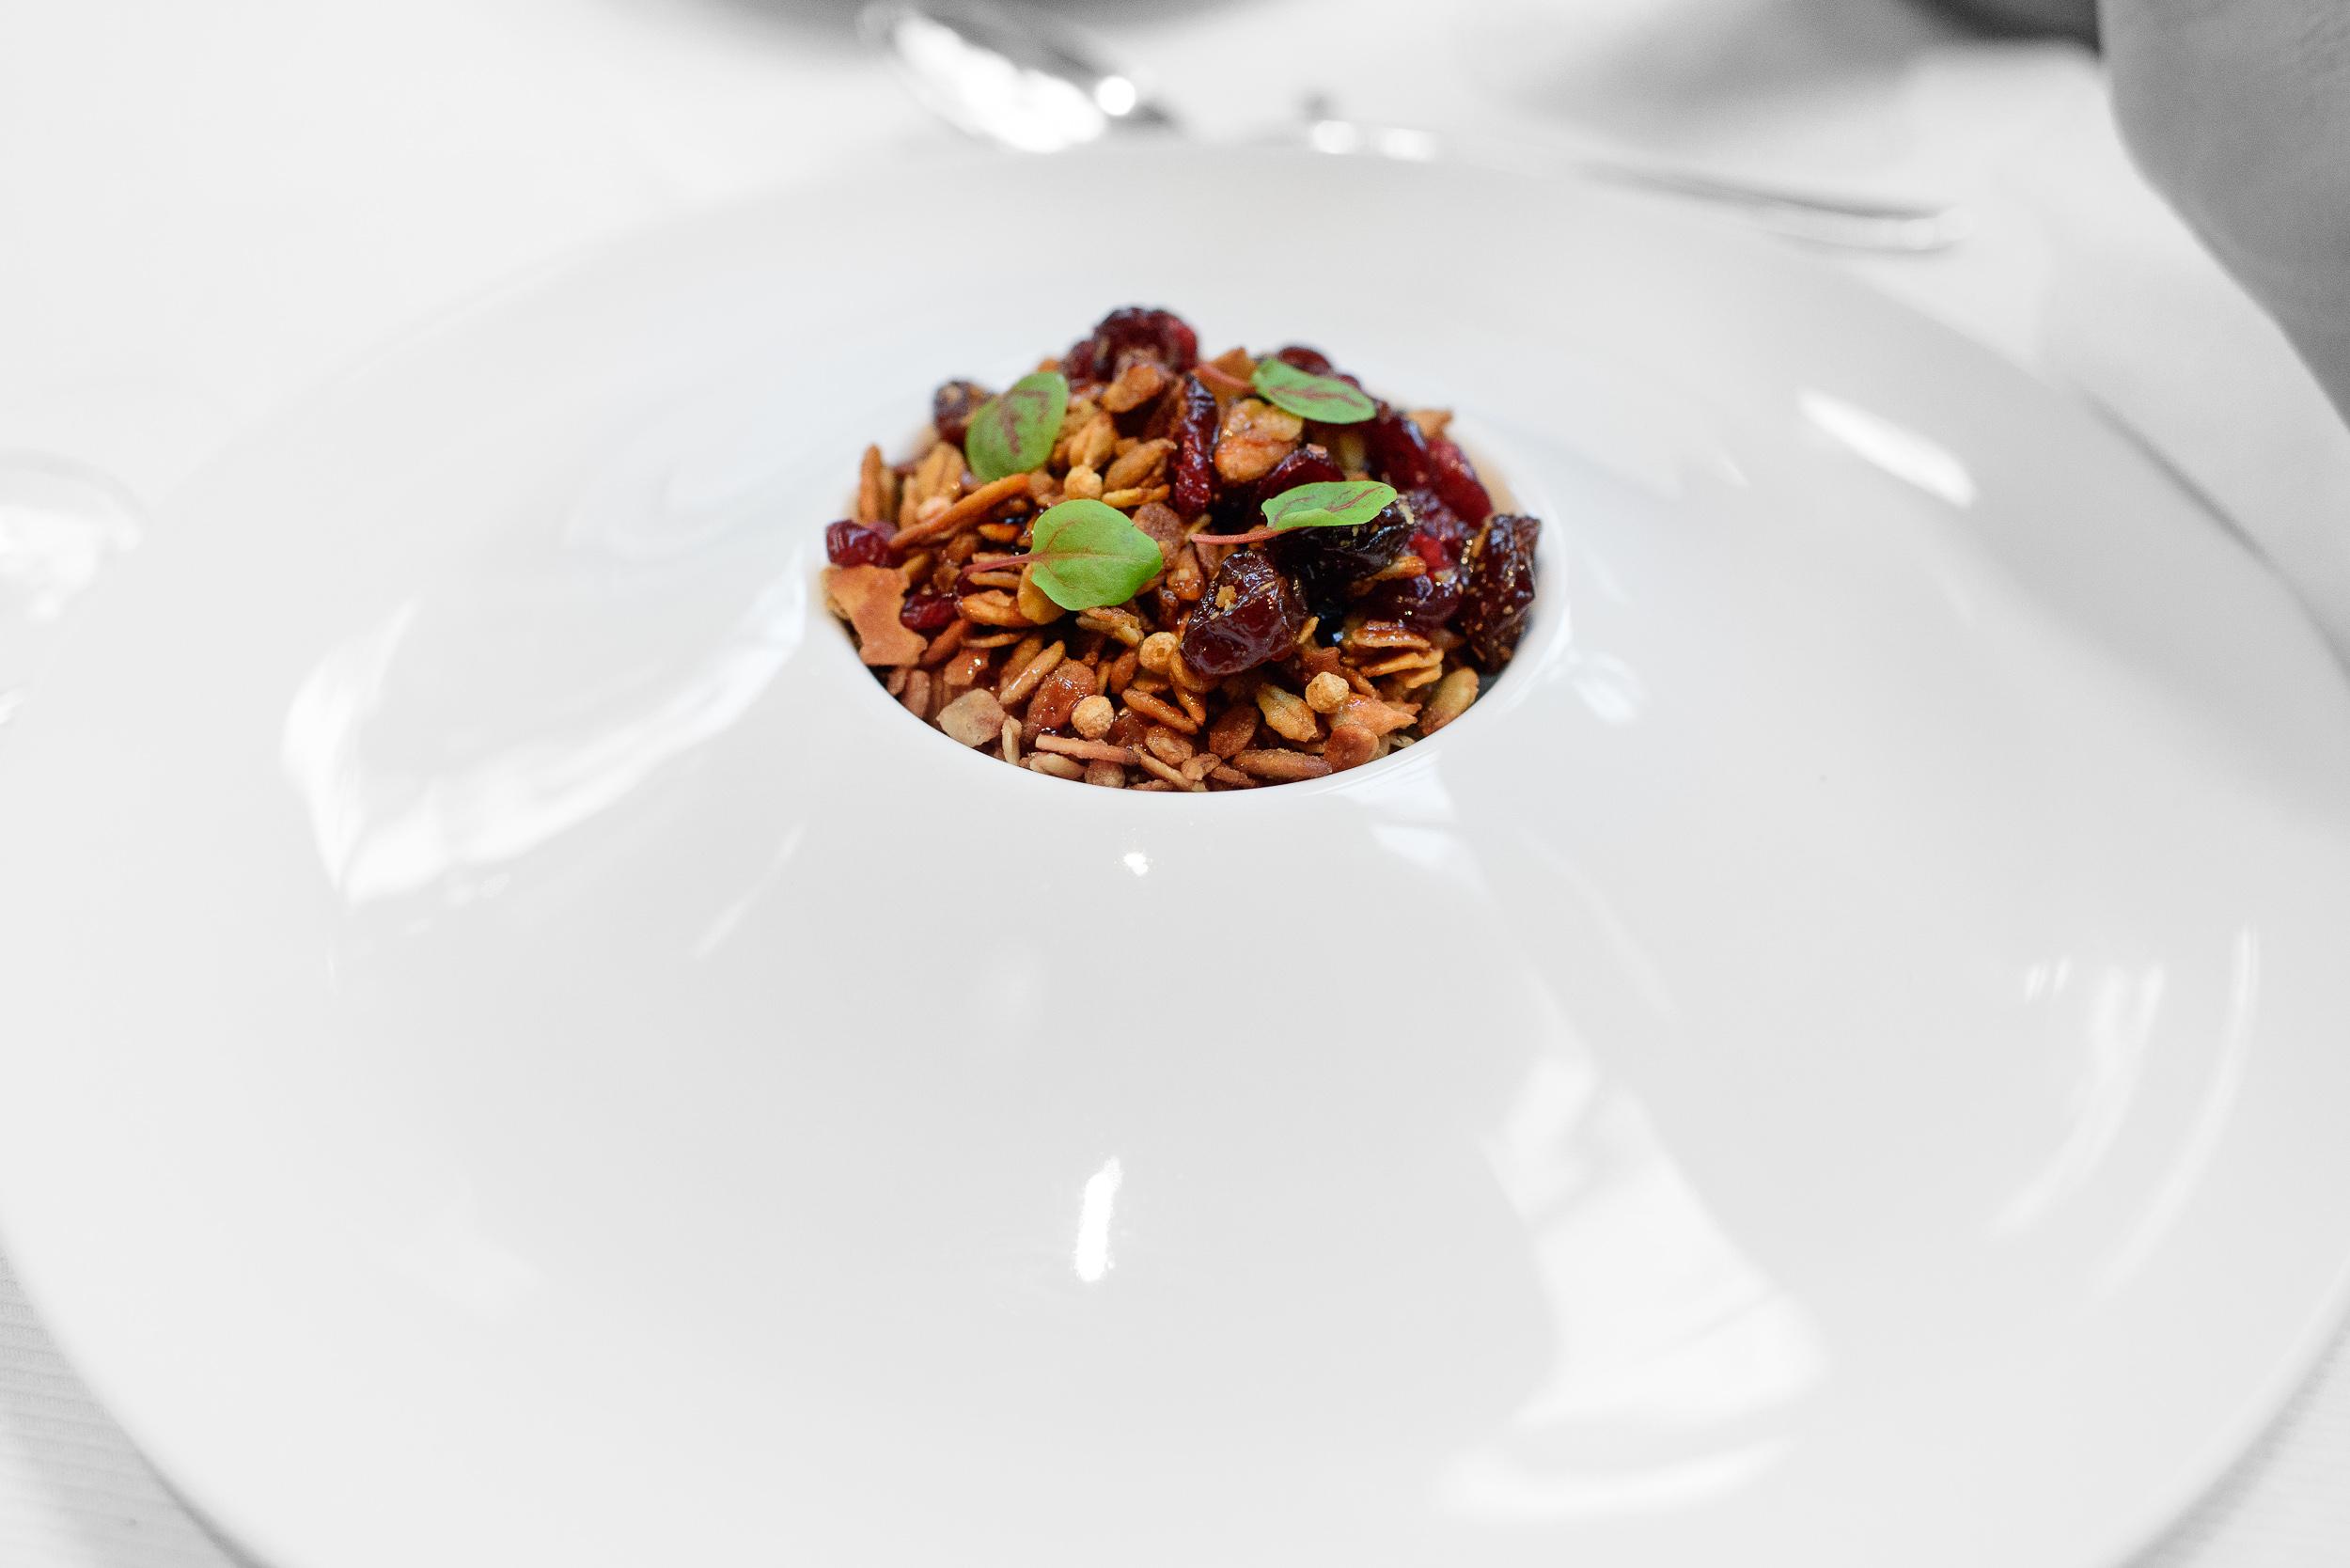 Foie gras, sour cherry granola, aged balsamic and sorrel